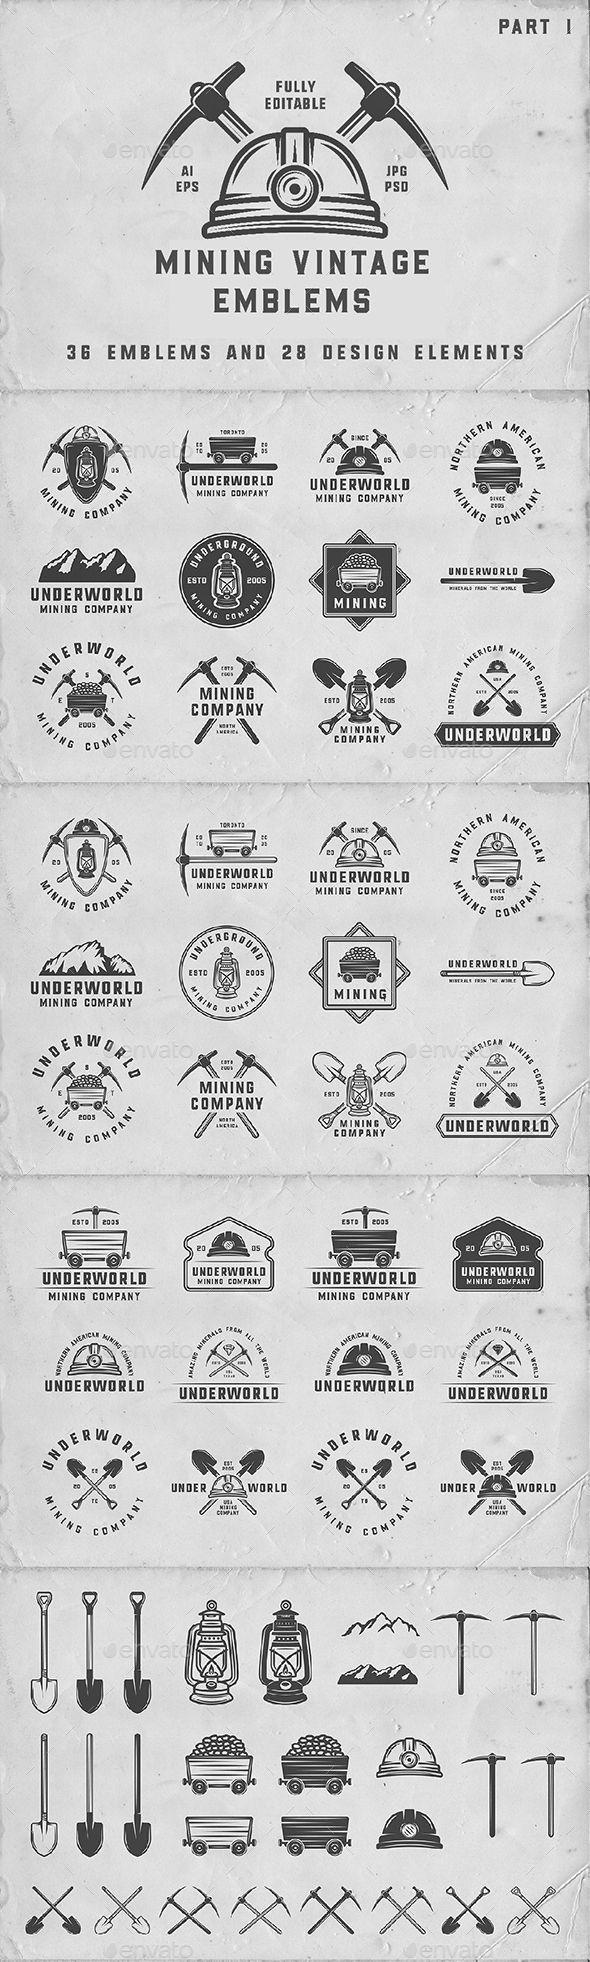 36 Vintage Mining Emblems Templates PSD, Vector EPS, AI Illustrator